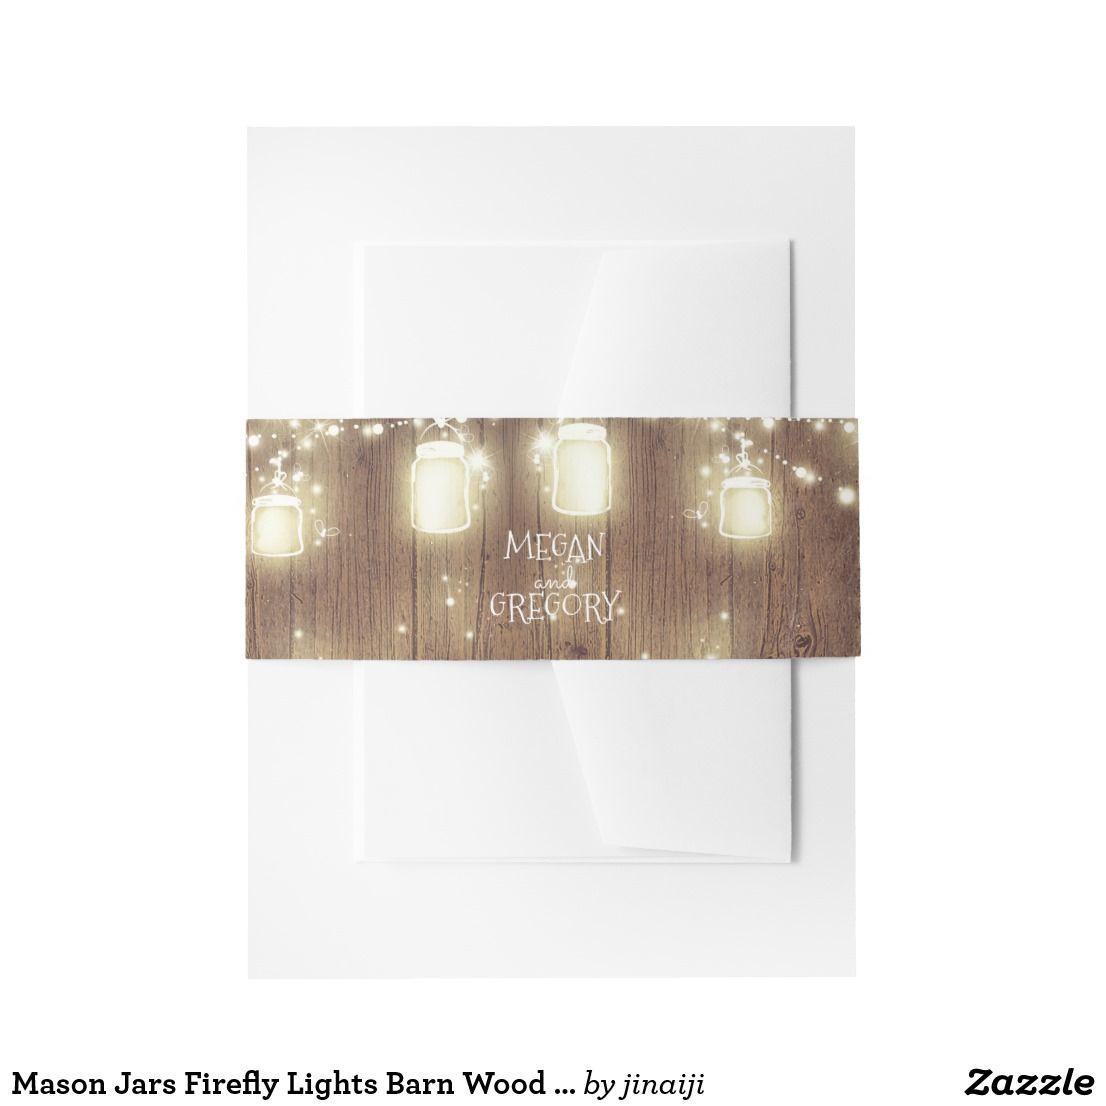 Mason Jars Firefly Lights Barn Wood Wedding Invitation Belly Band ...